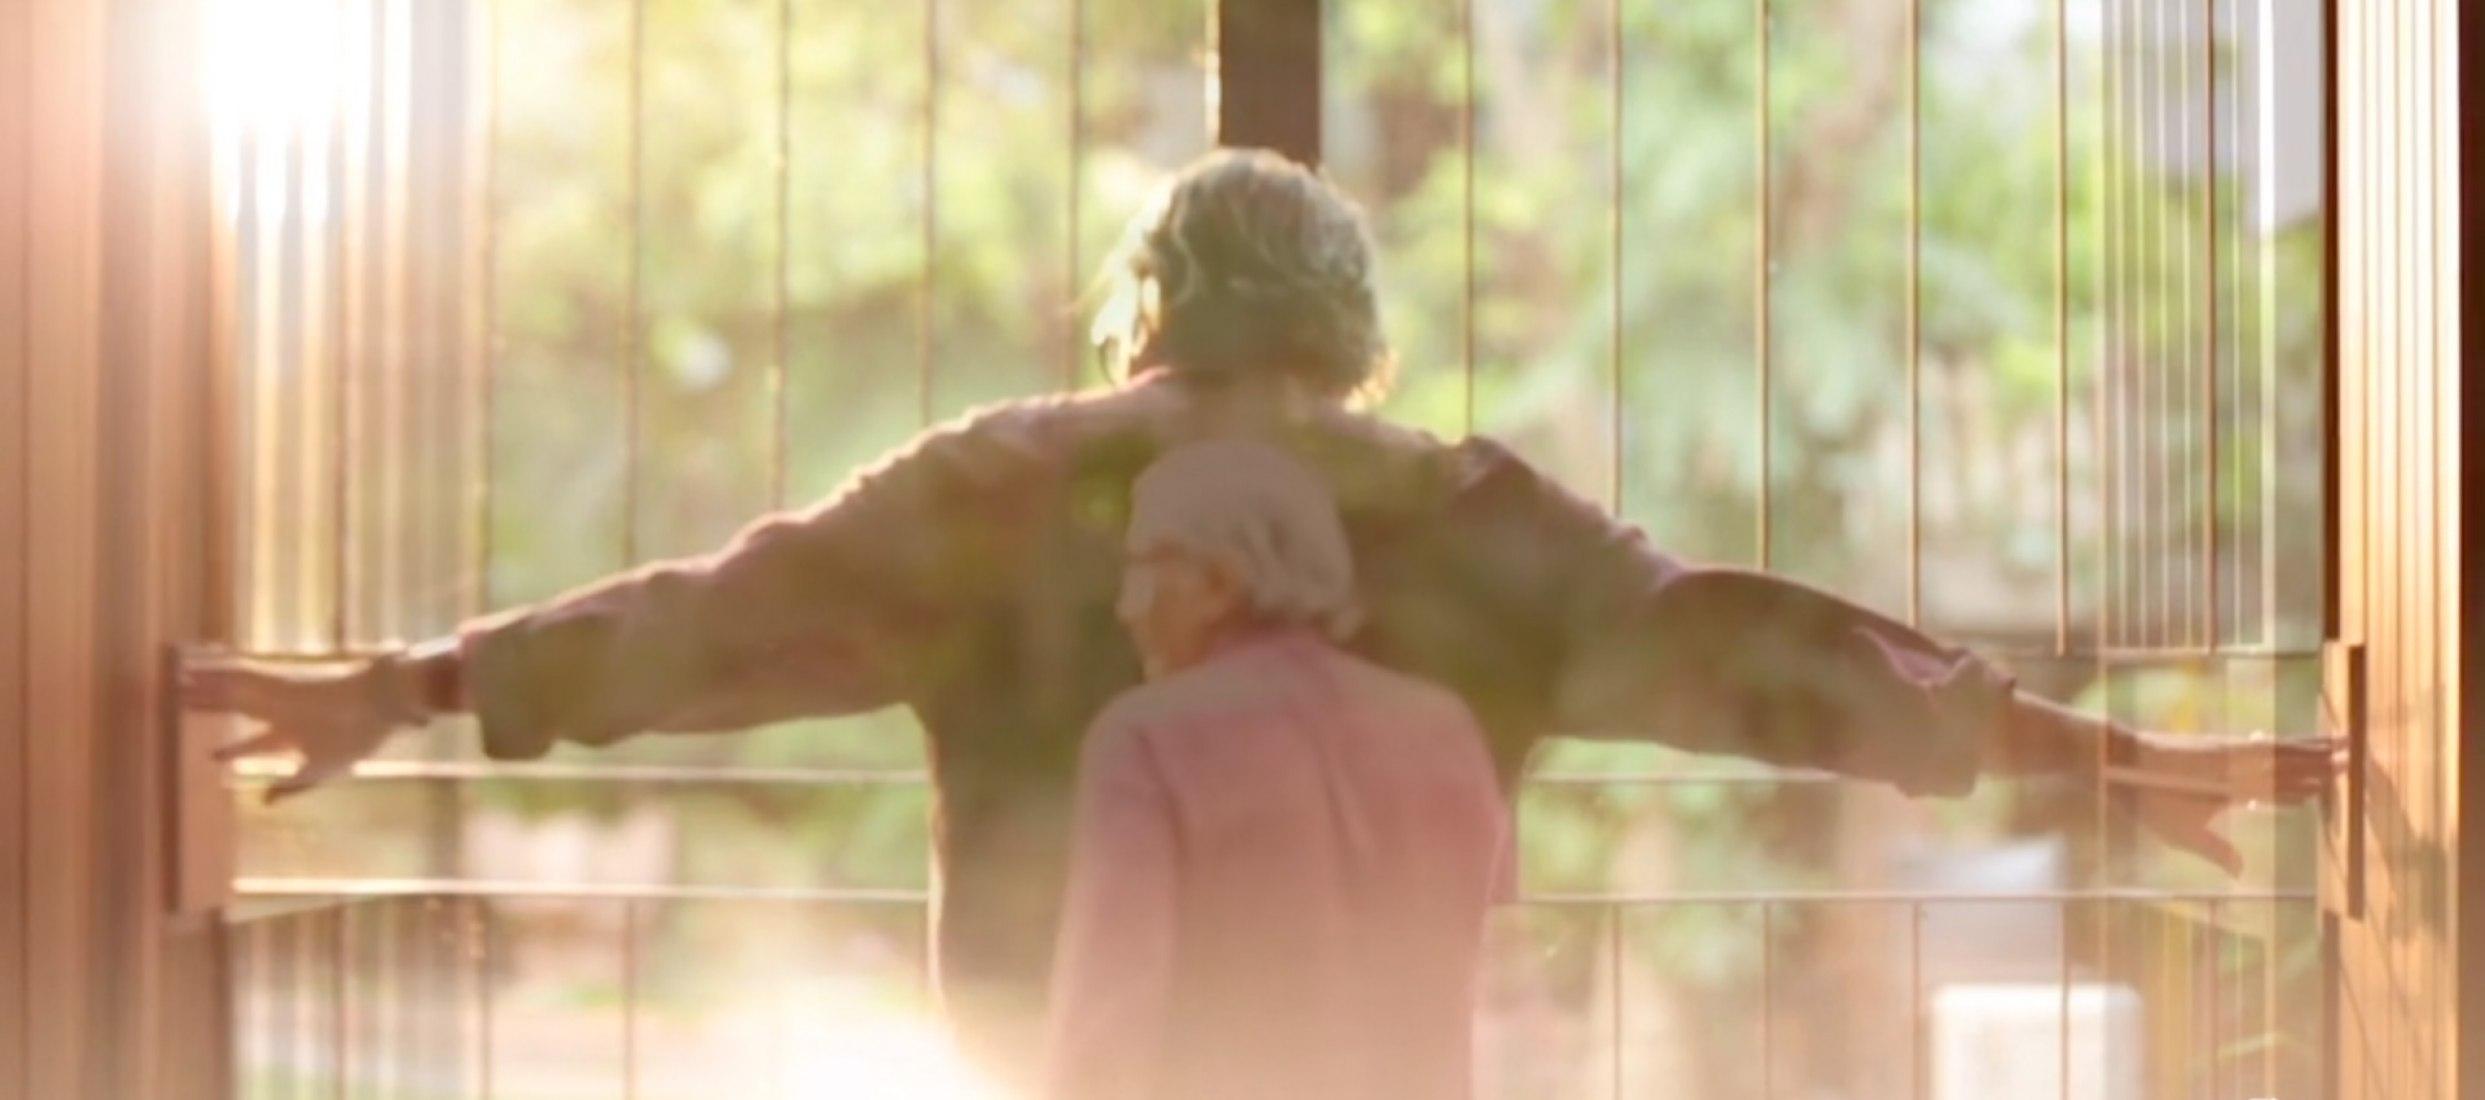 [VIDEOs] Balkrishna Doshi. Premio Pritzker de Arquitectura 2018 [III].